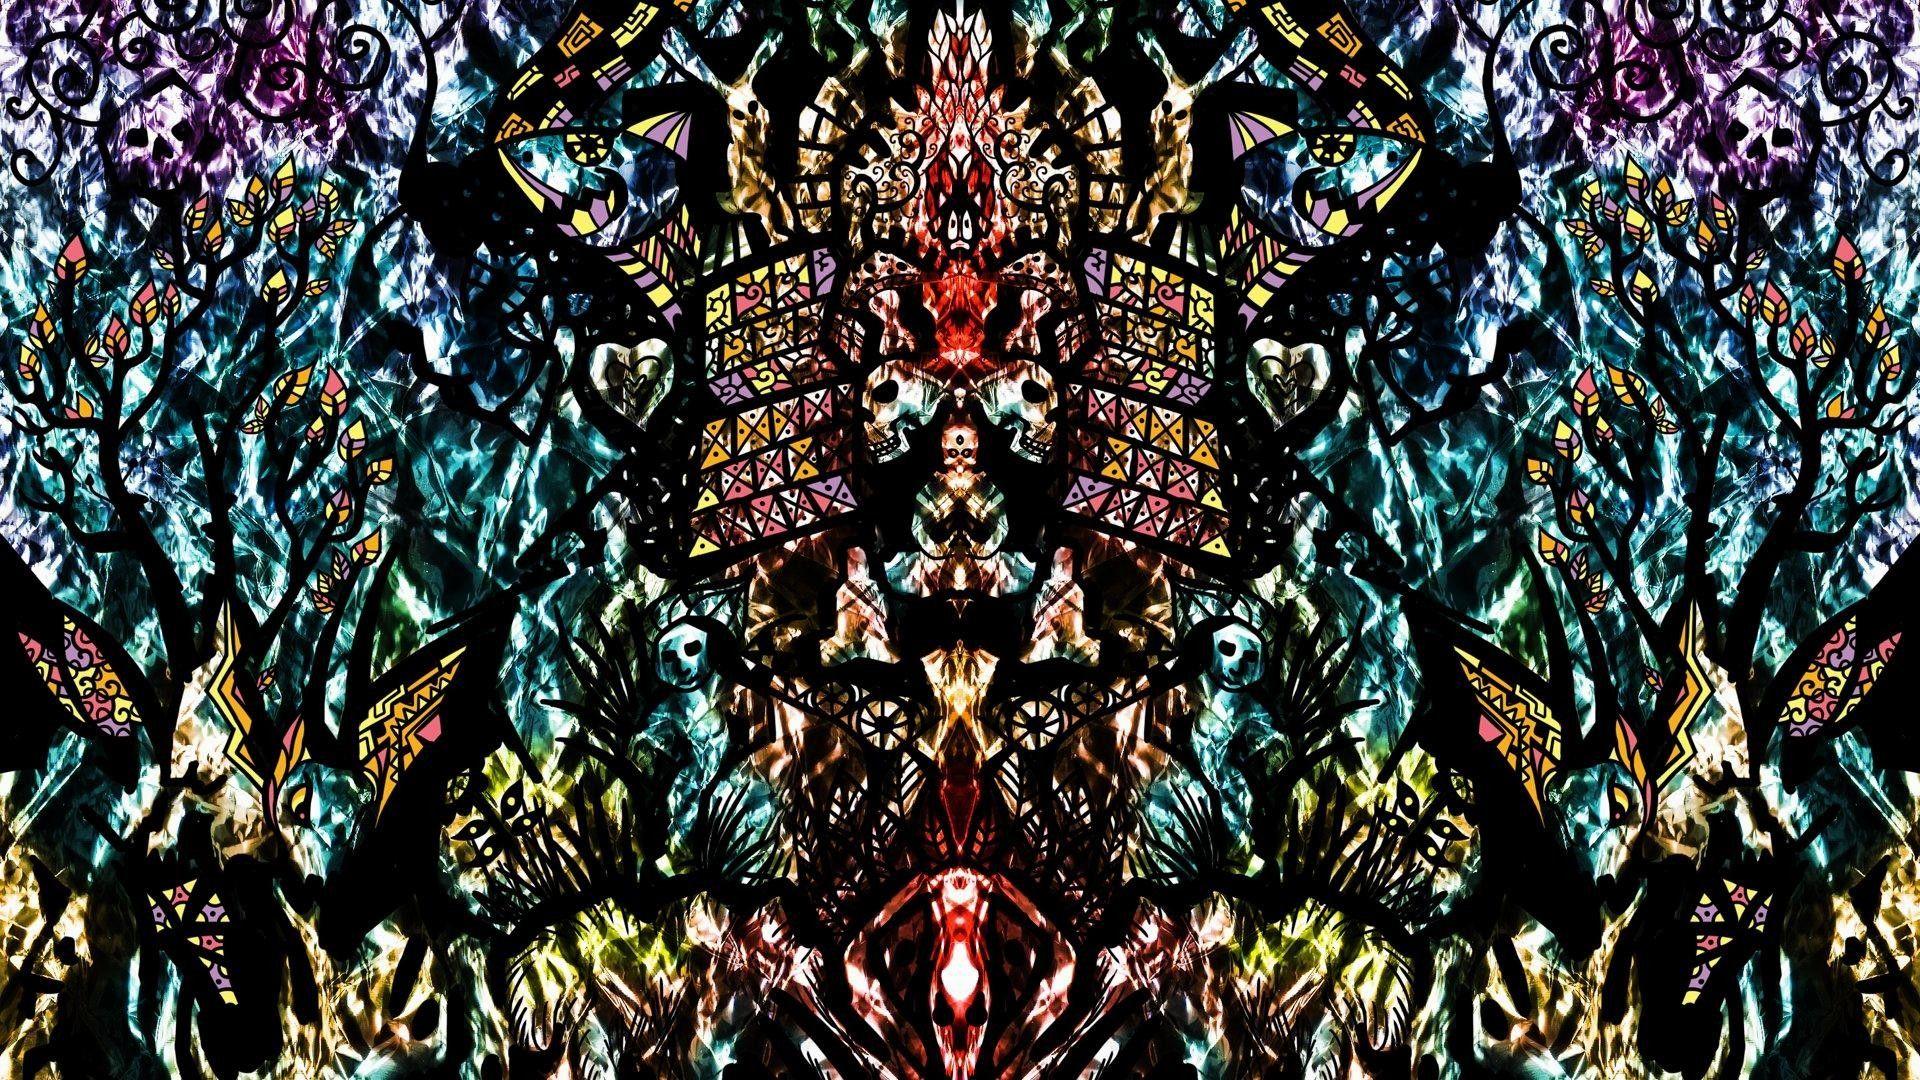 1920x1080 psychedelic wallpapers Hippie wallpaper